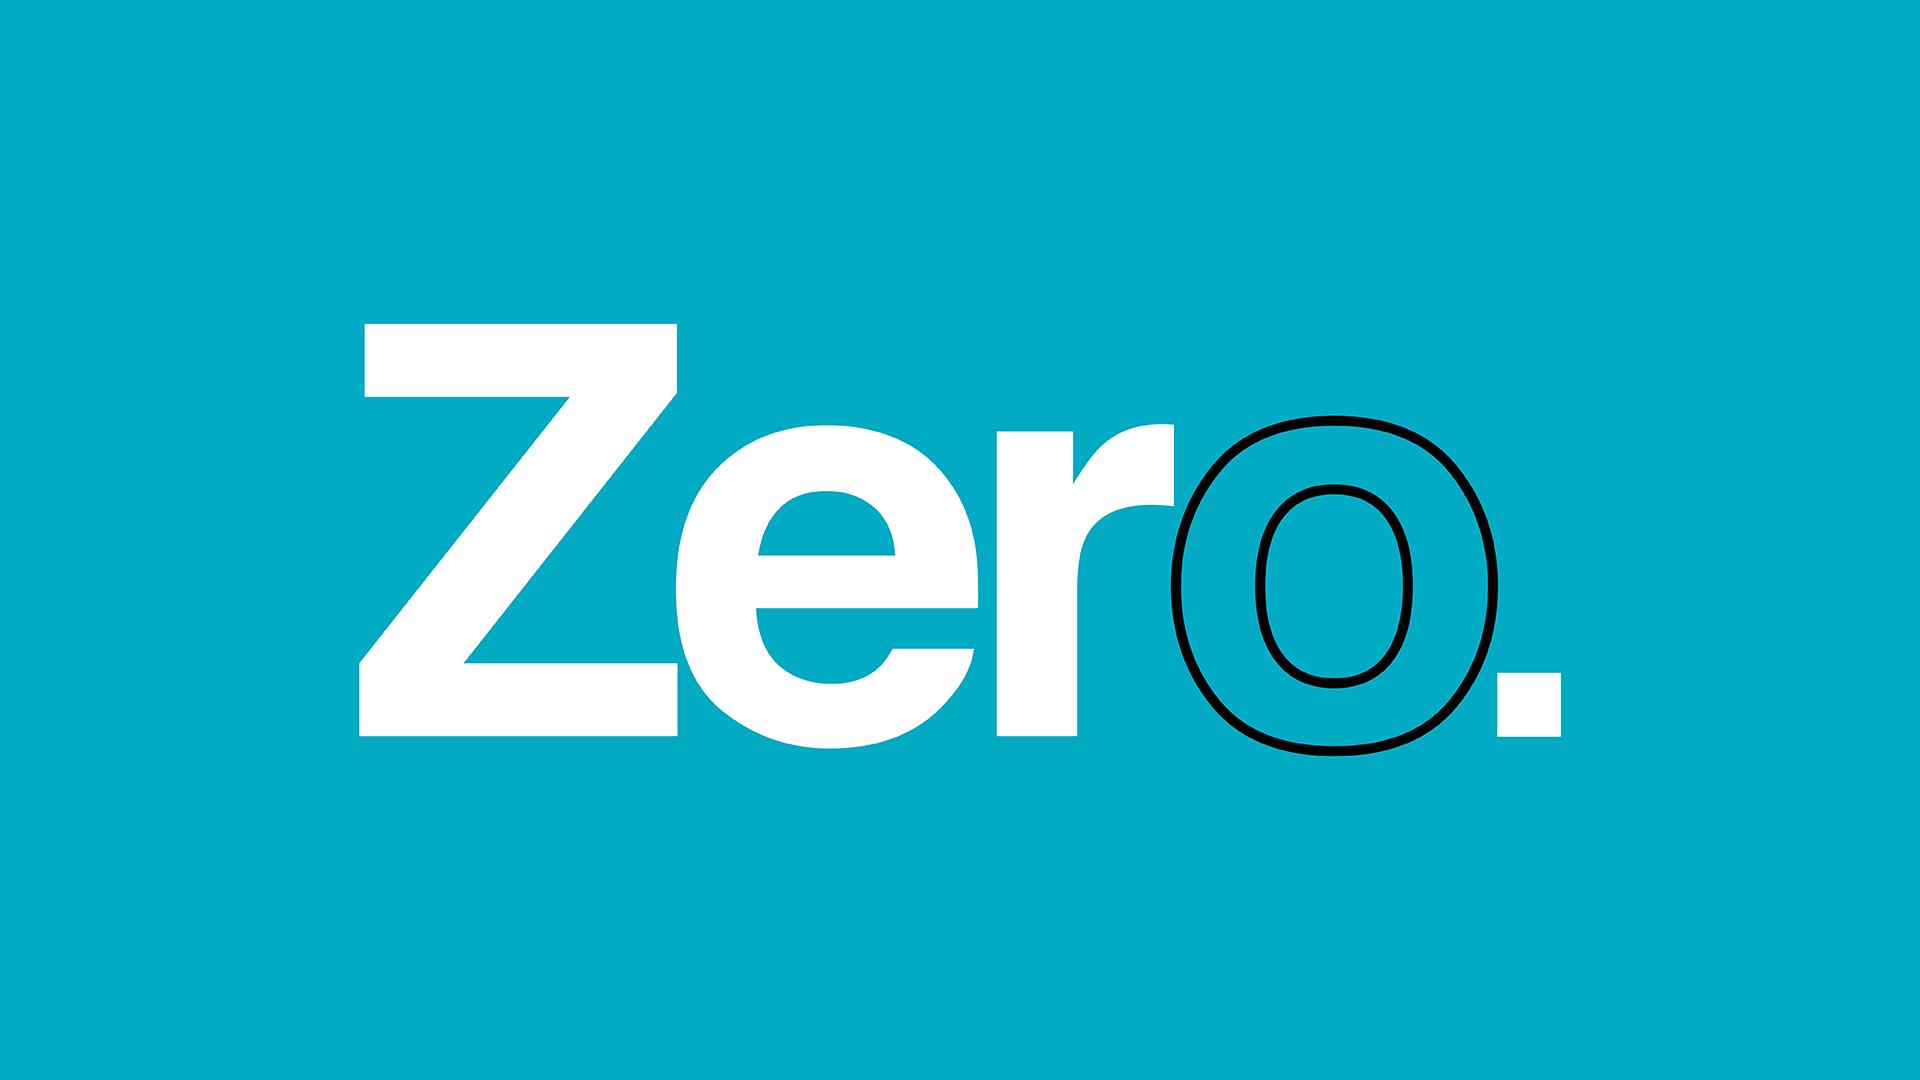 rncm and students� union launch zerotolerance campaign